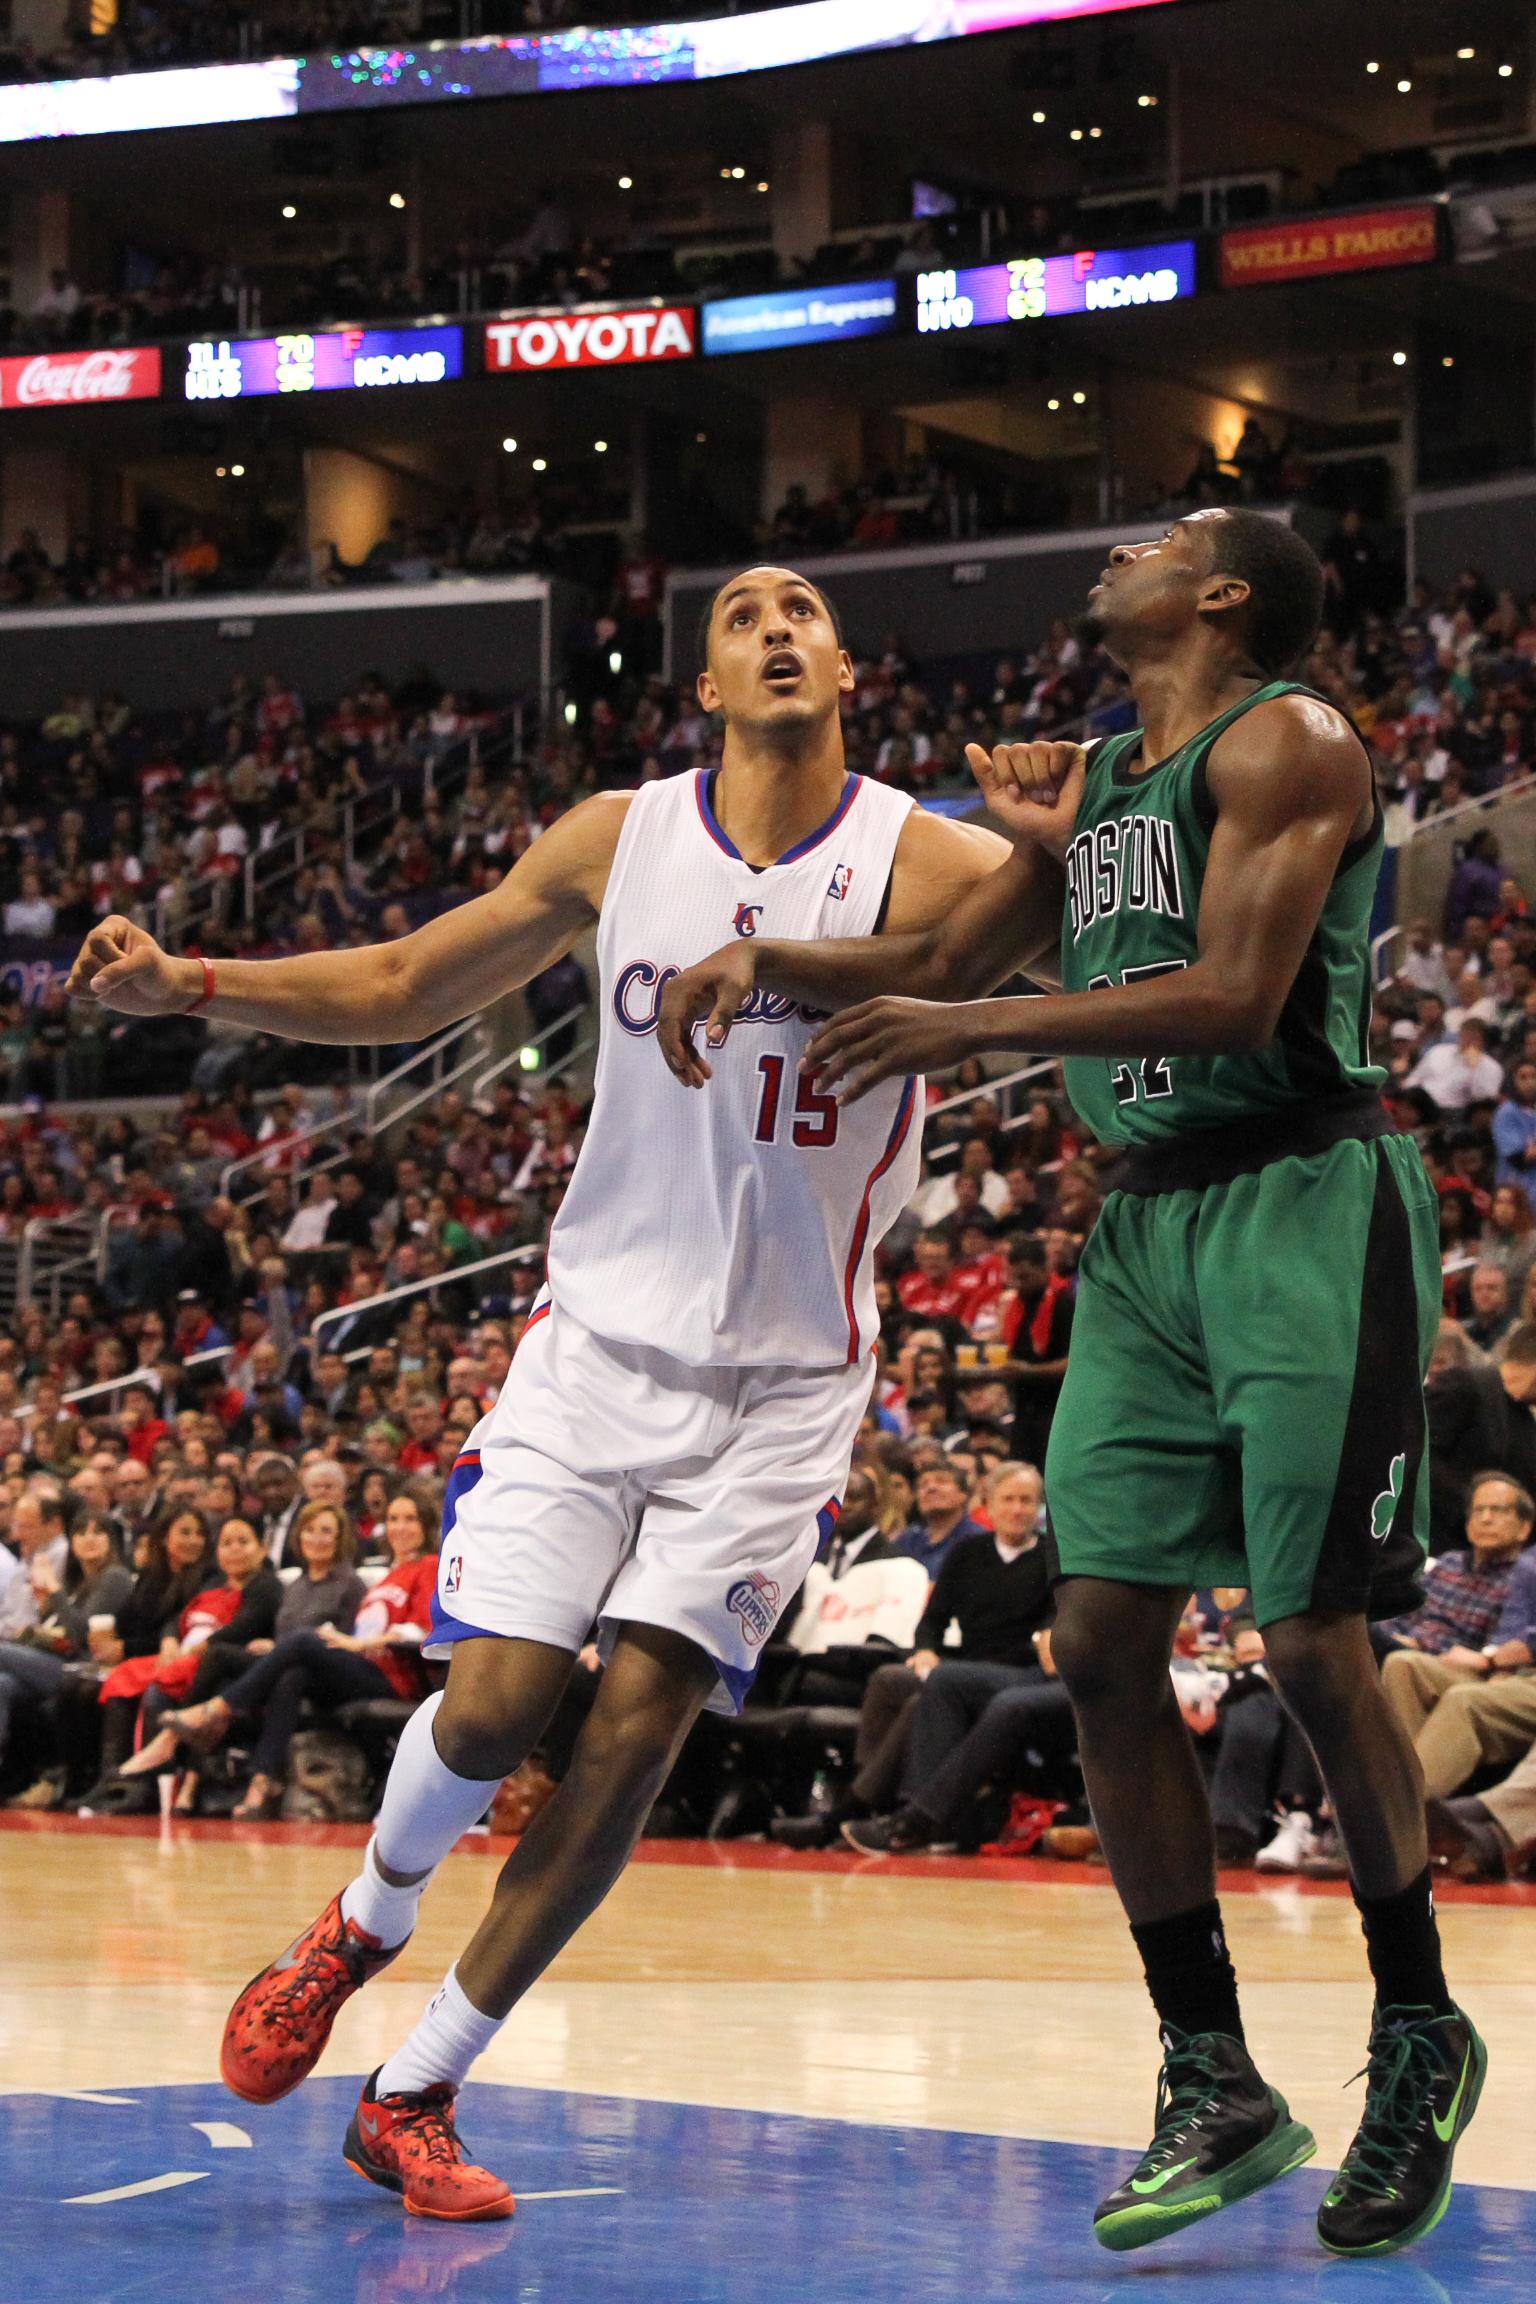 Photos by Varon P. Celtics FR-33.jpg